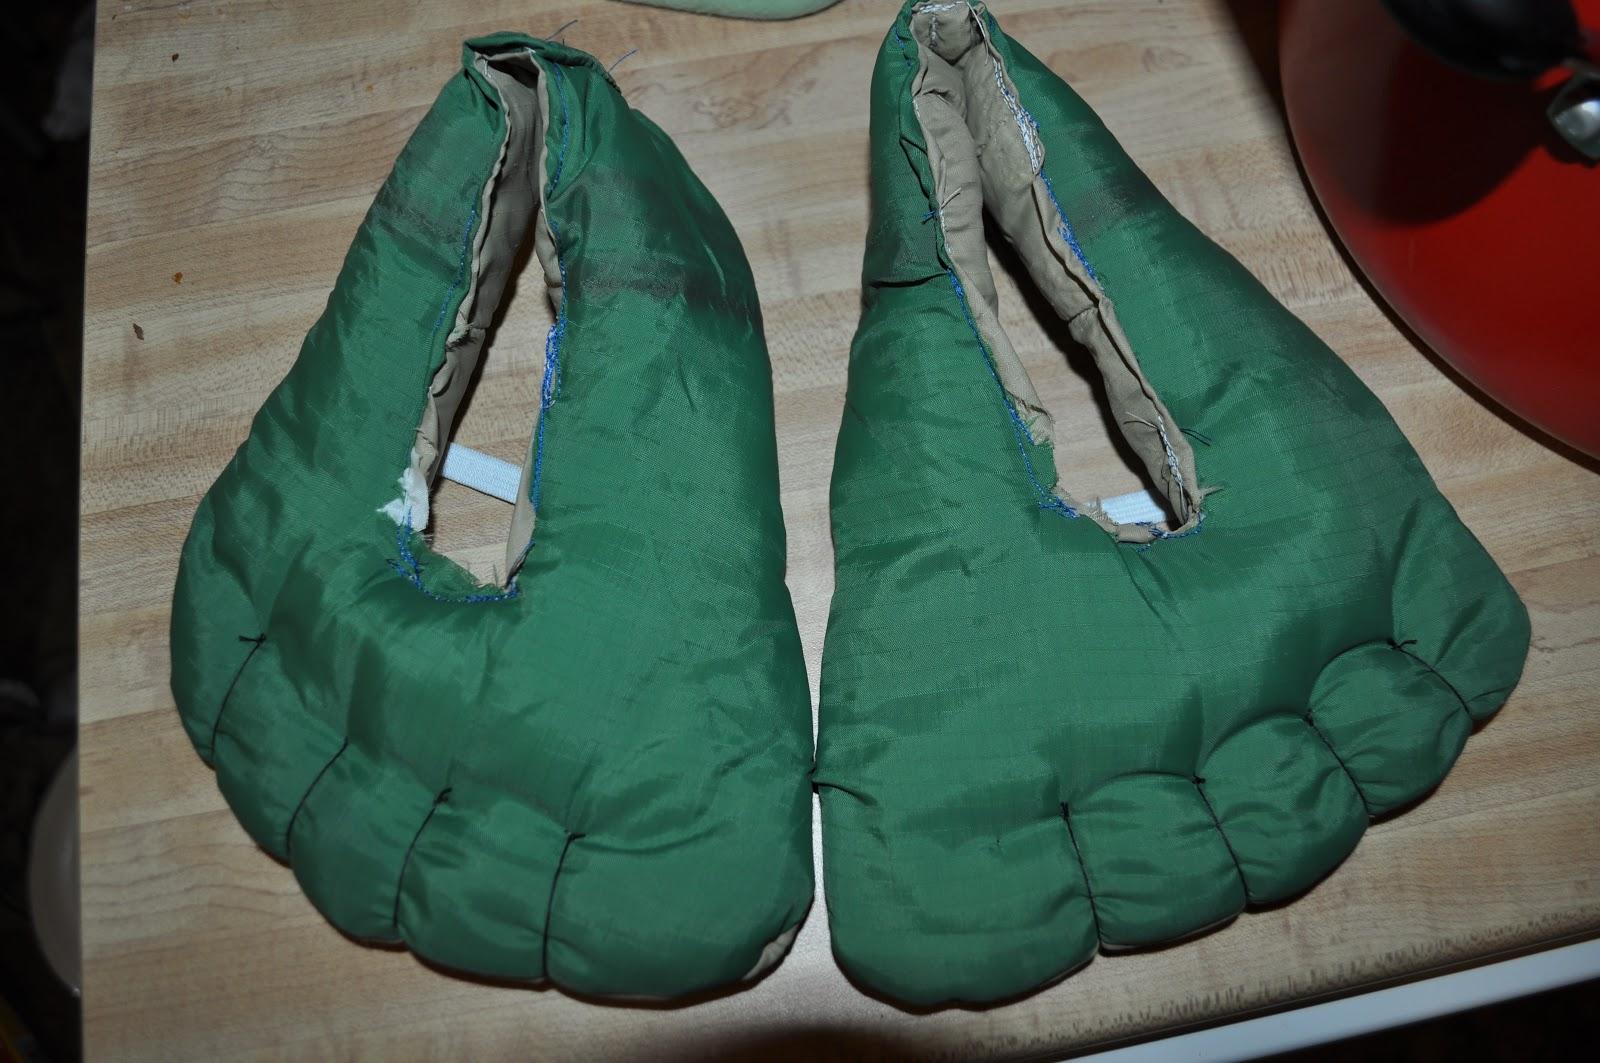 Incredible Hulk Toe Shoes